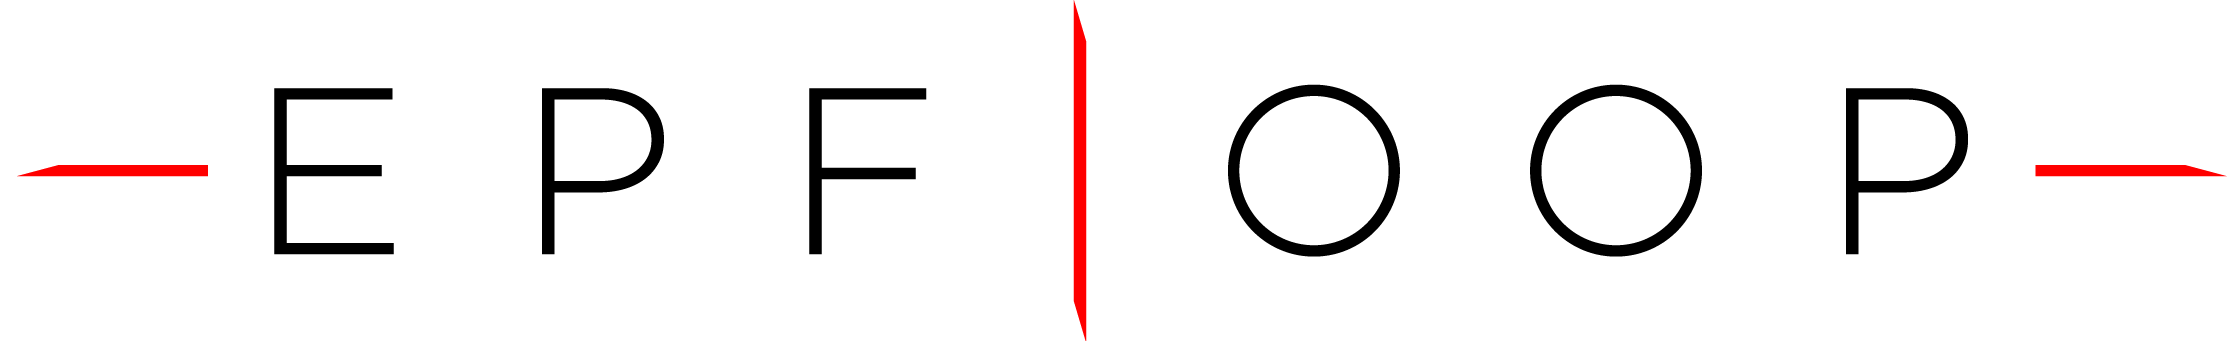 EPFLoop logo font black